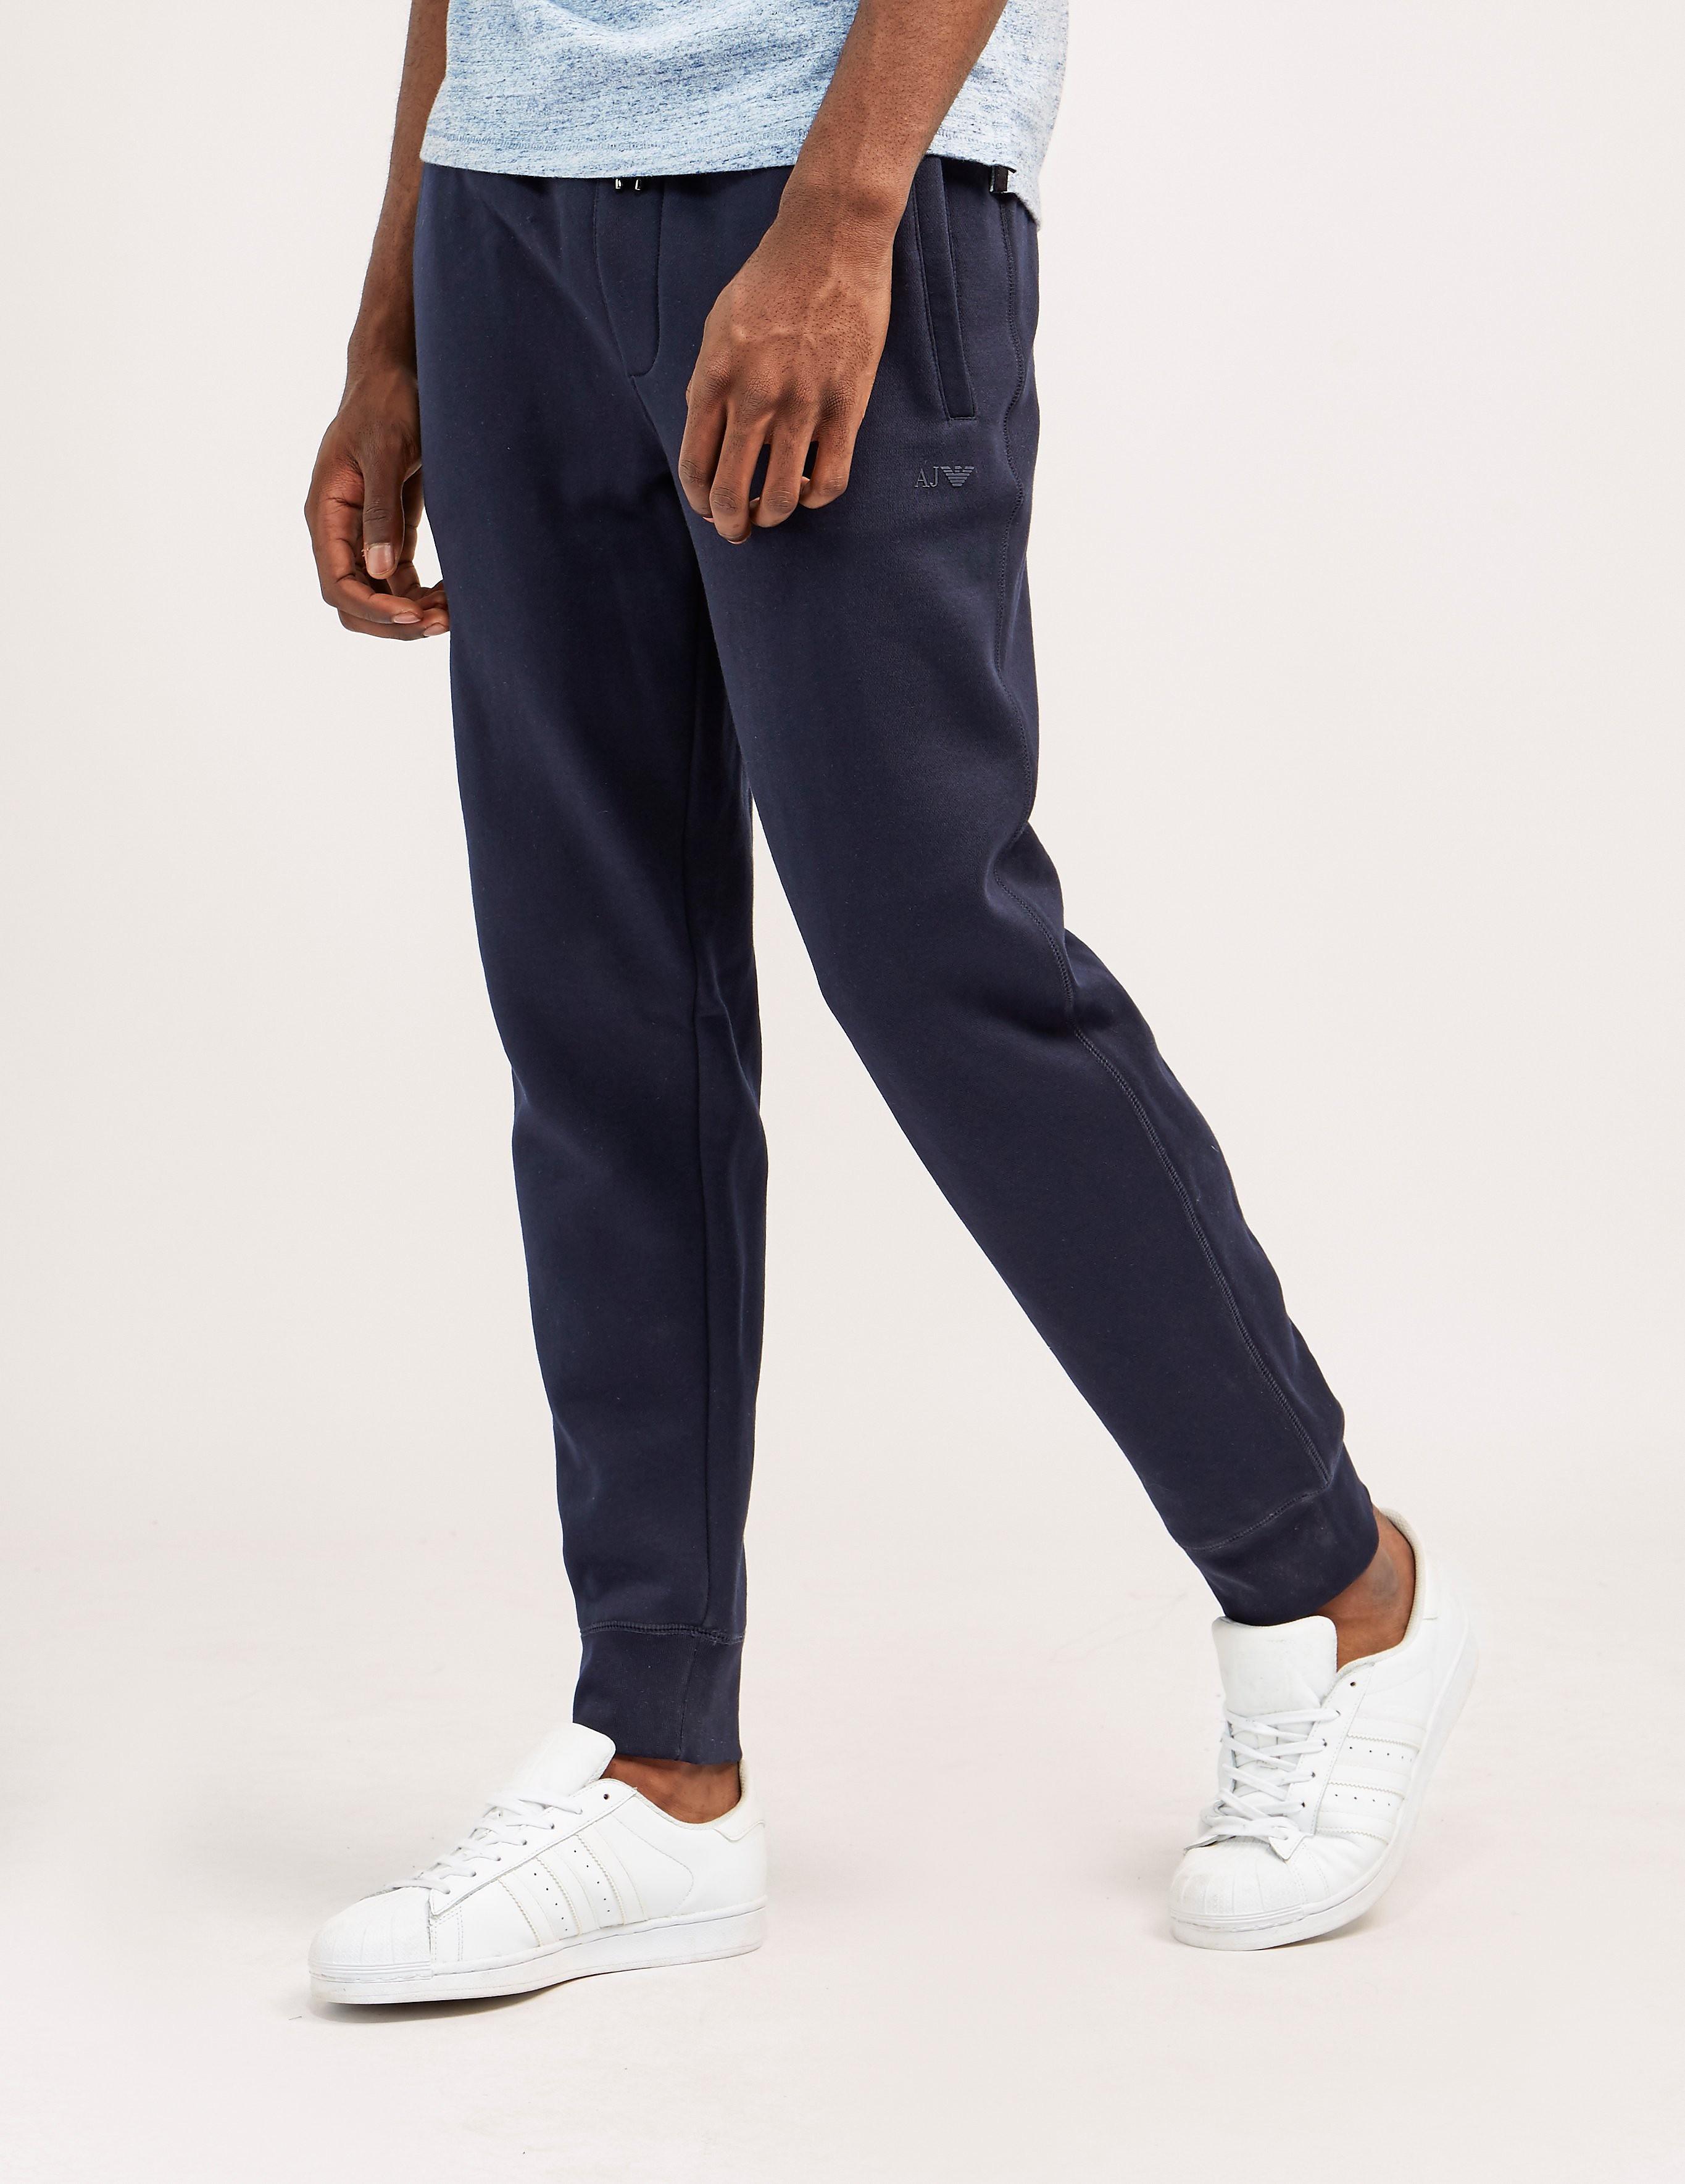 Armani Jeans Cuff Track Pant